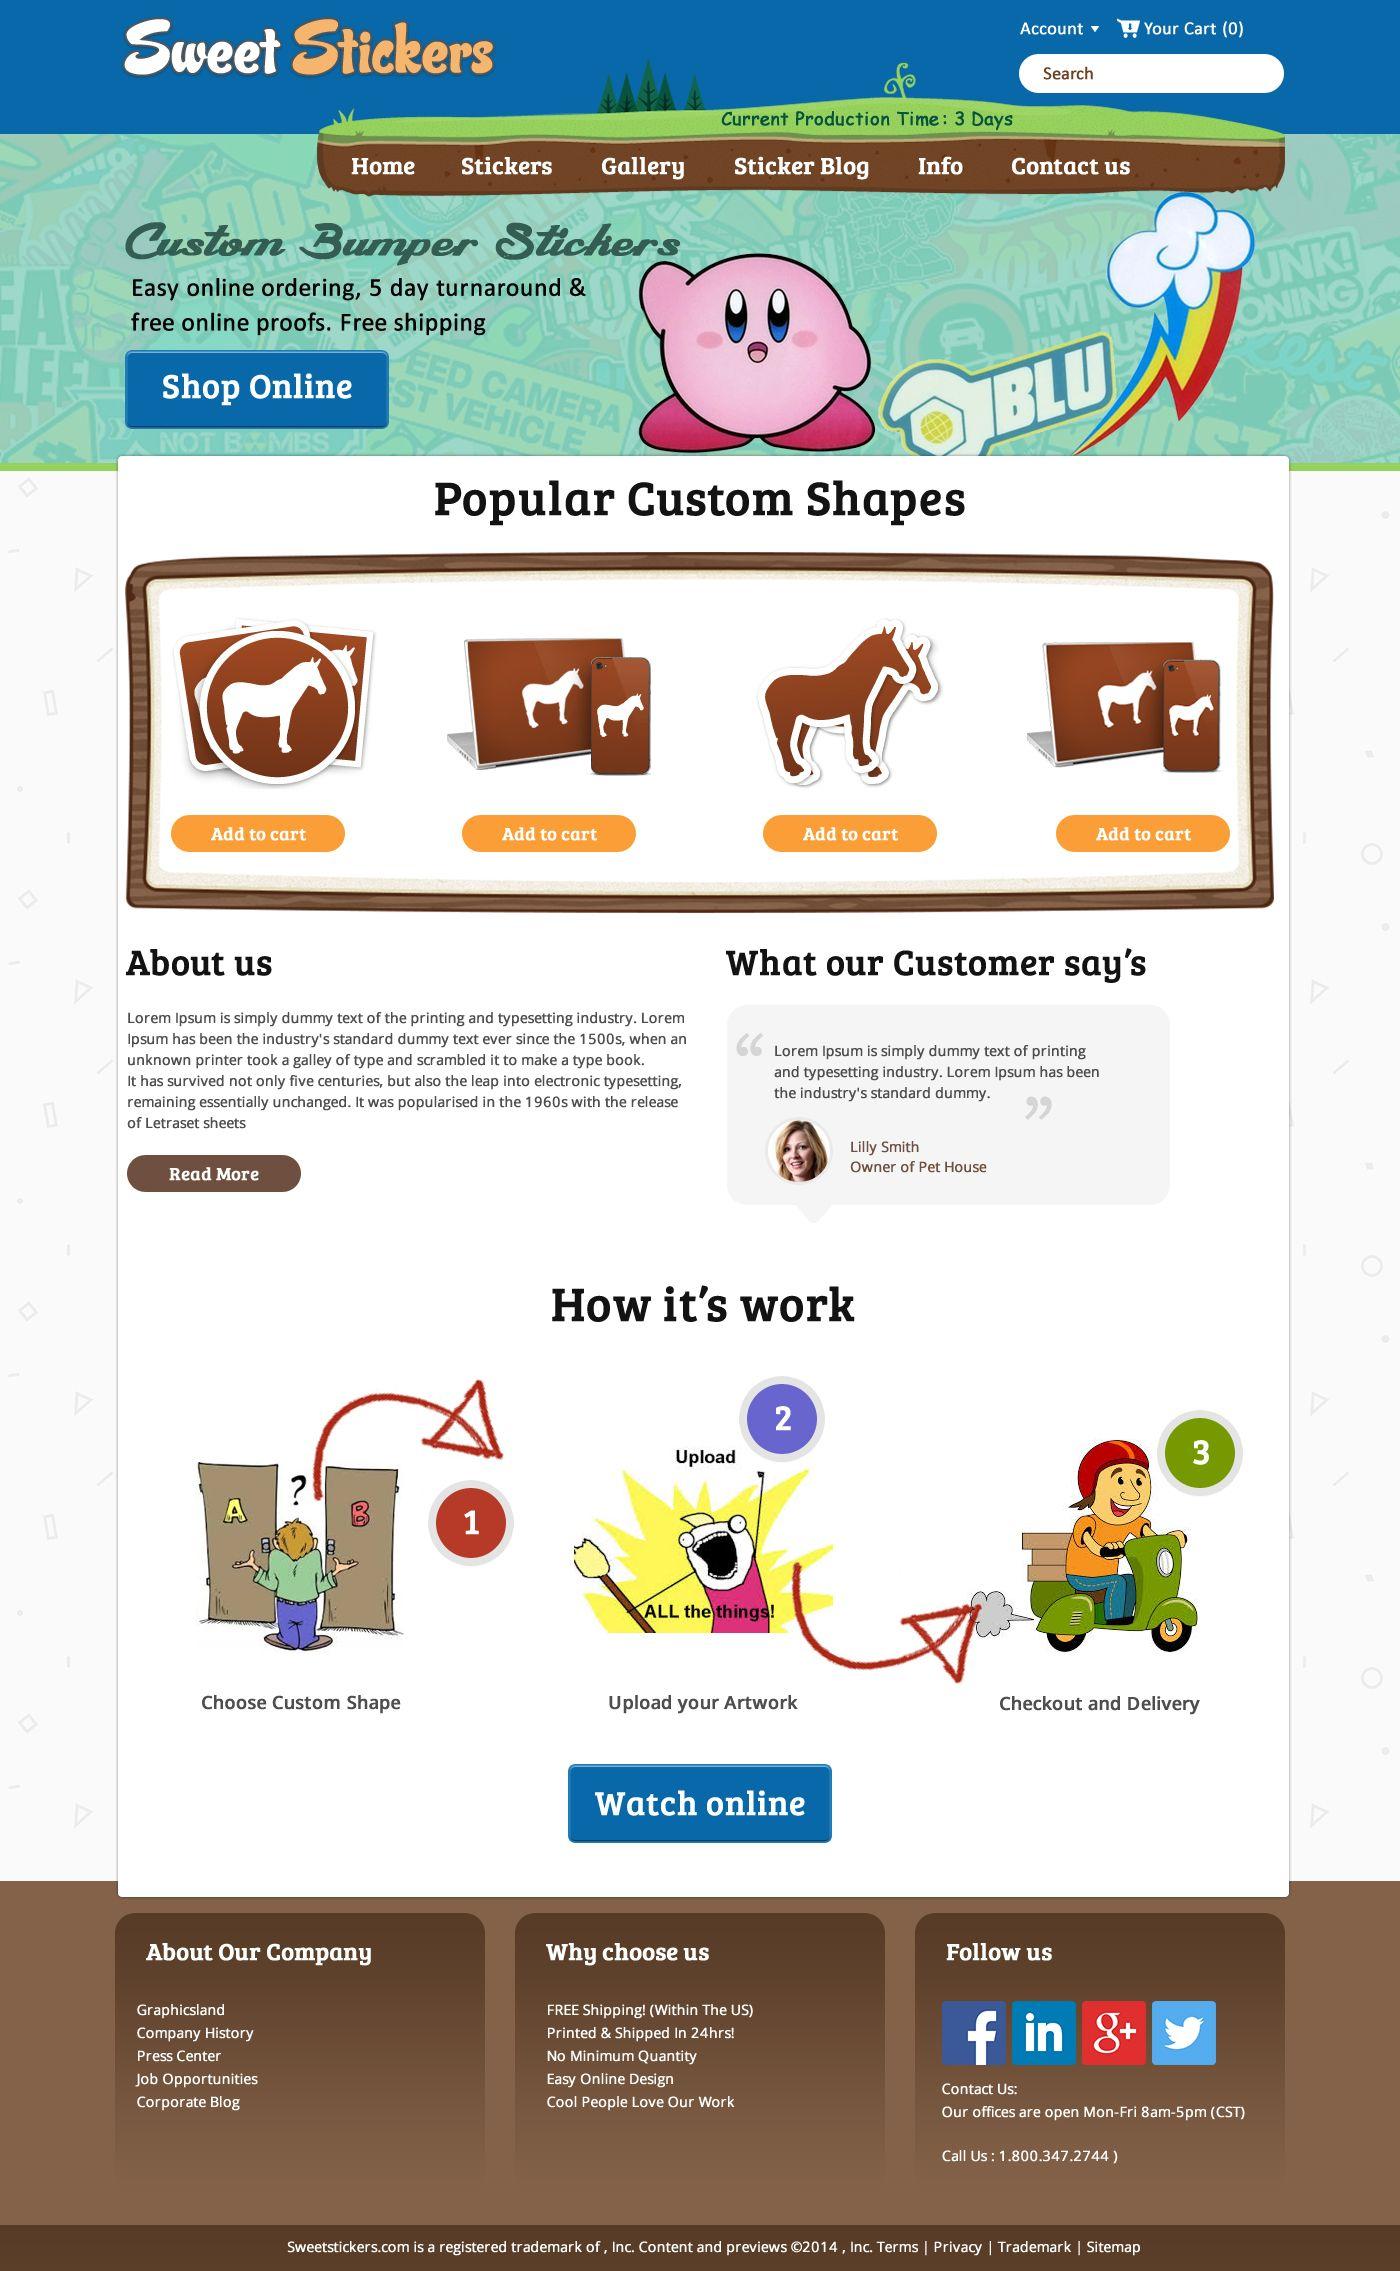 Sweet stickers online custom bumper stickers homepage design